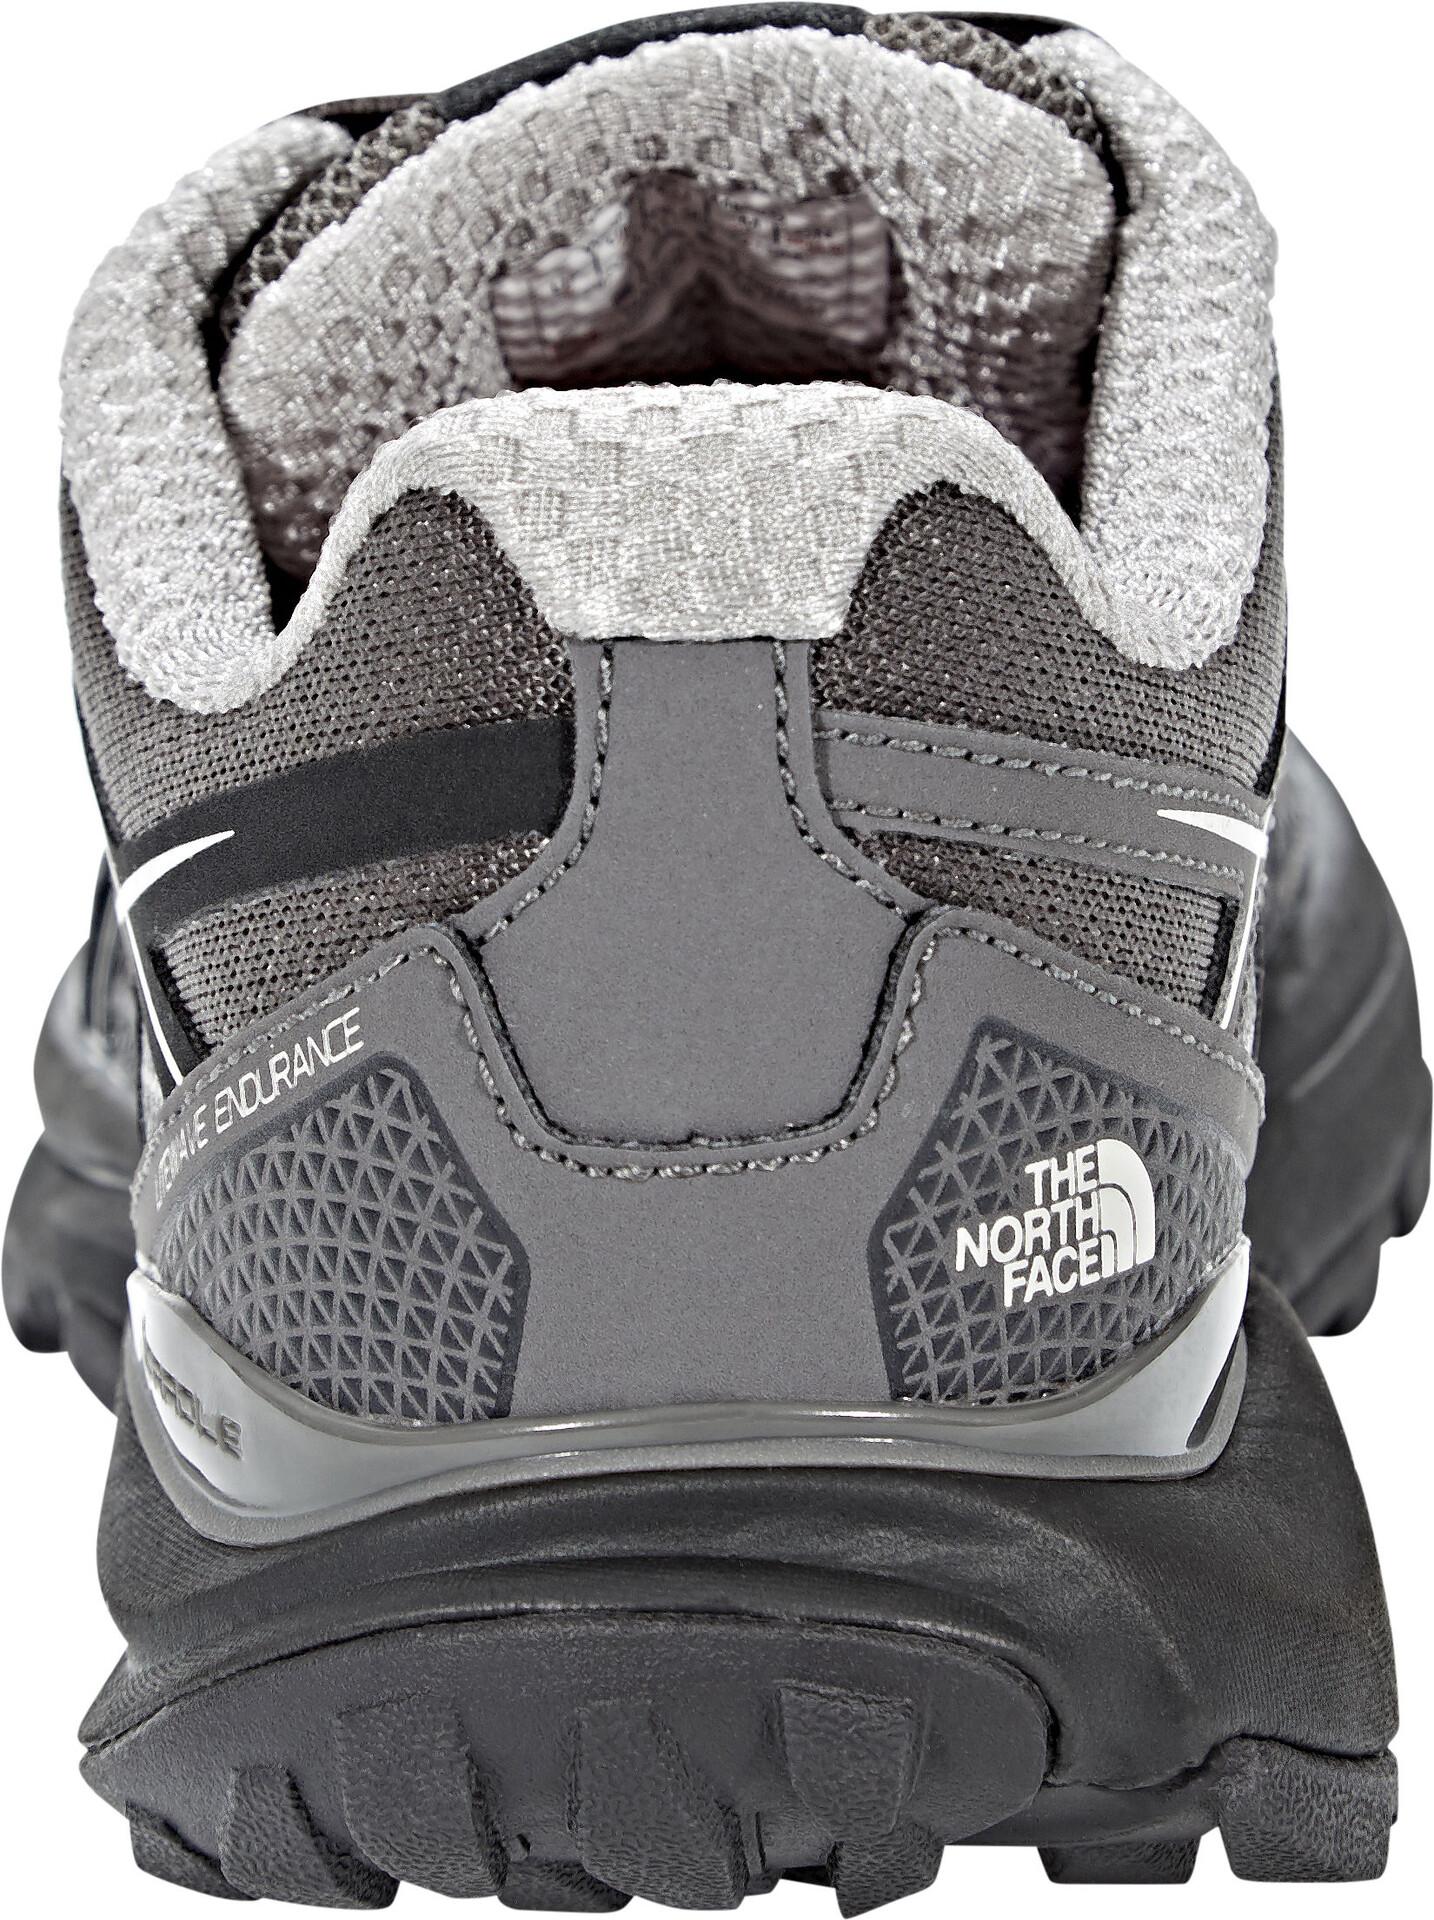 The North Face Litewave Endurance Running Trail Shoes Dame dark gull greyfoil grey